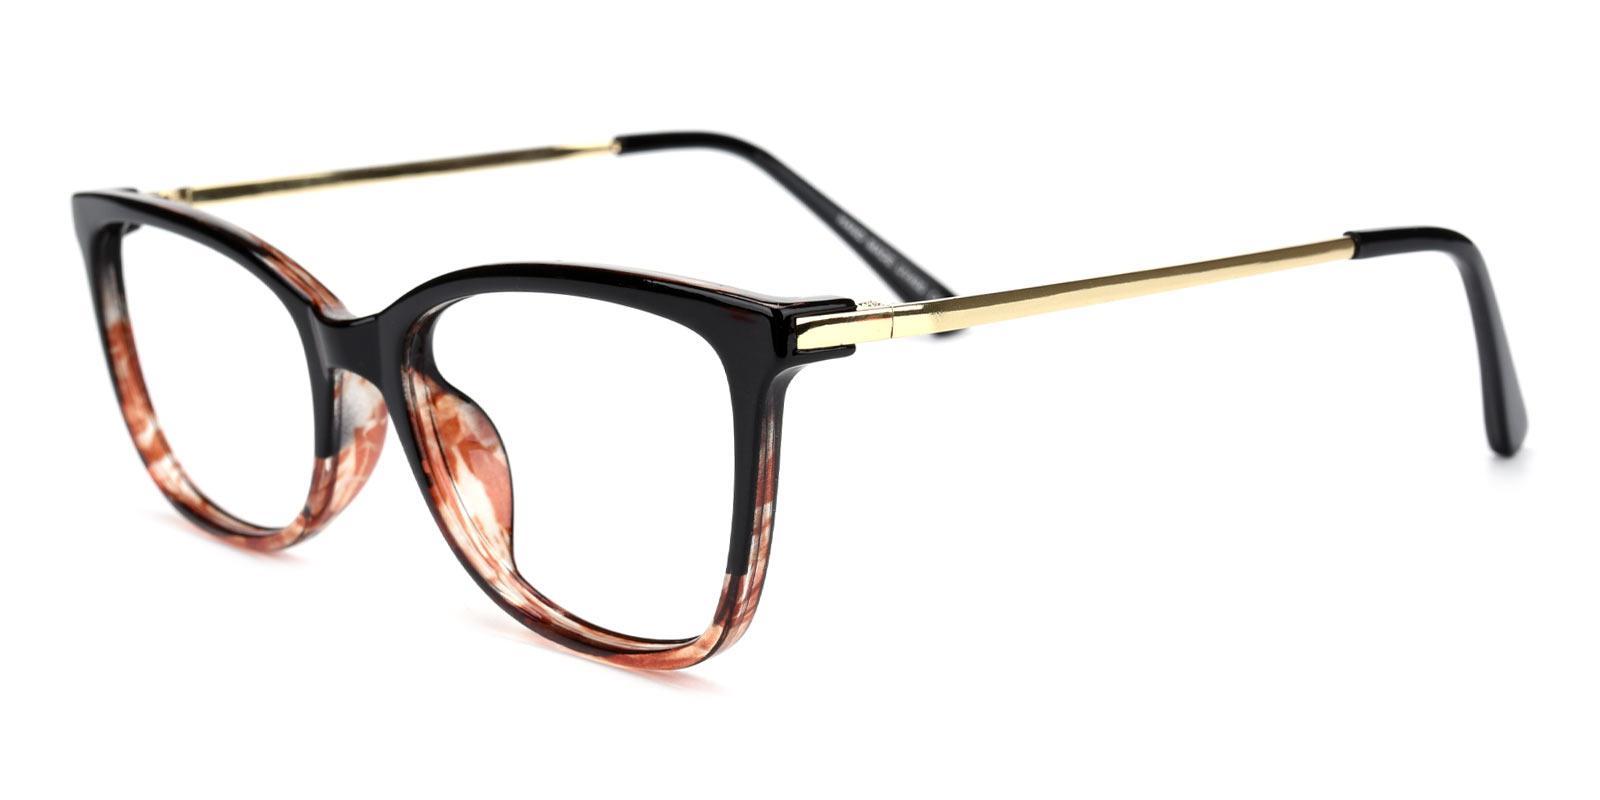 Monica-Tortoise-Rectangle-Acetate-Eyeglasses-additional1